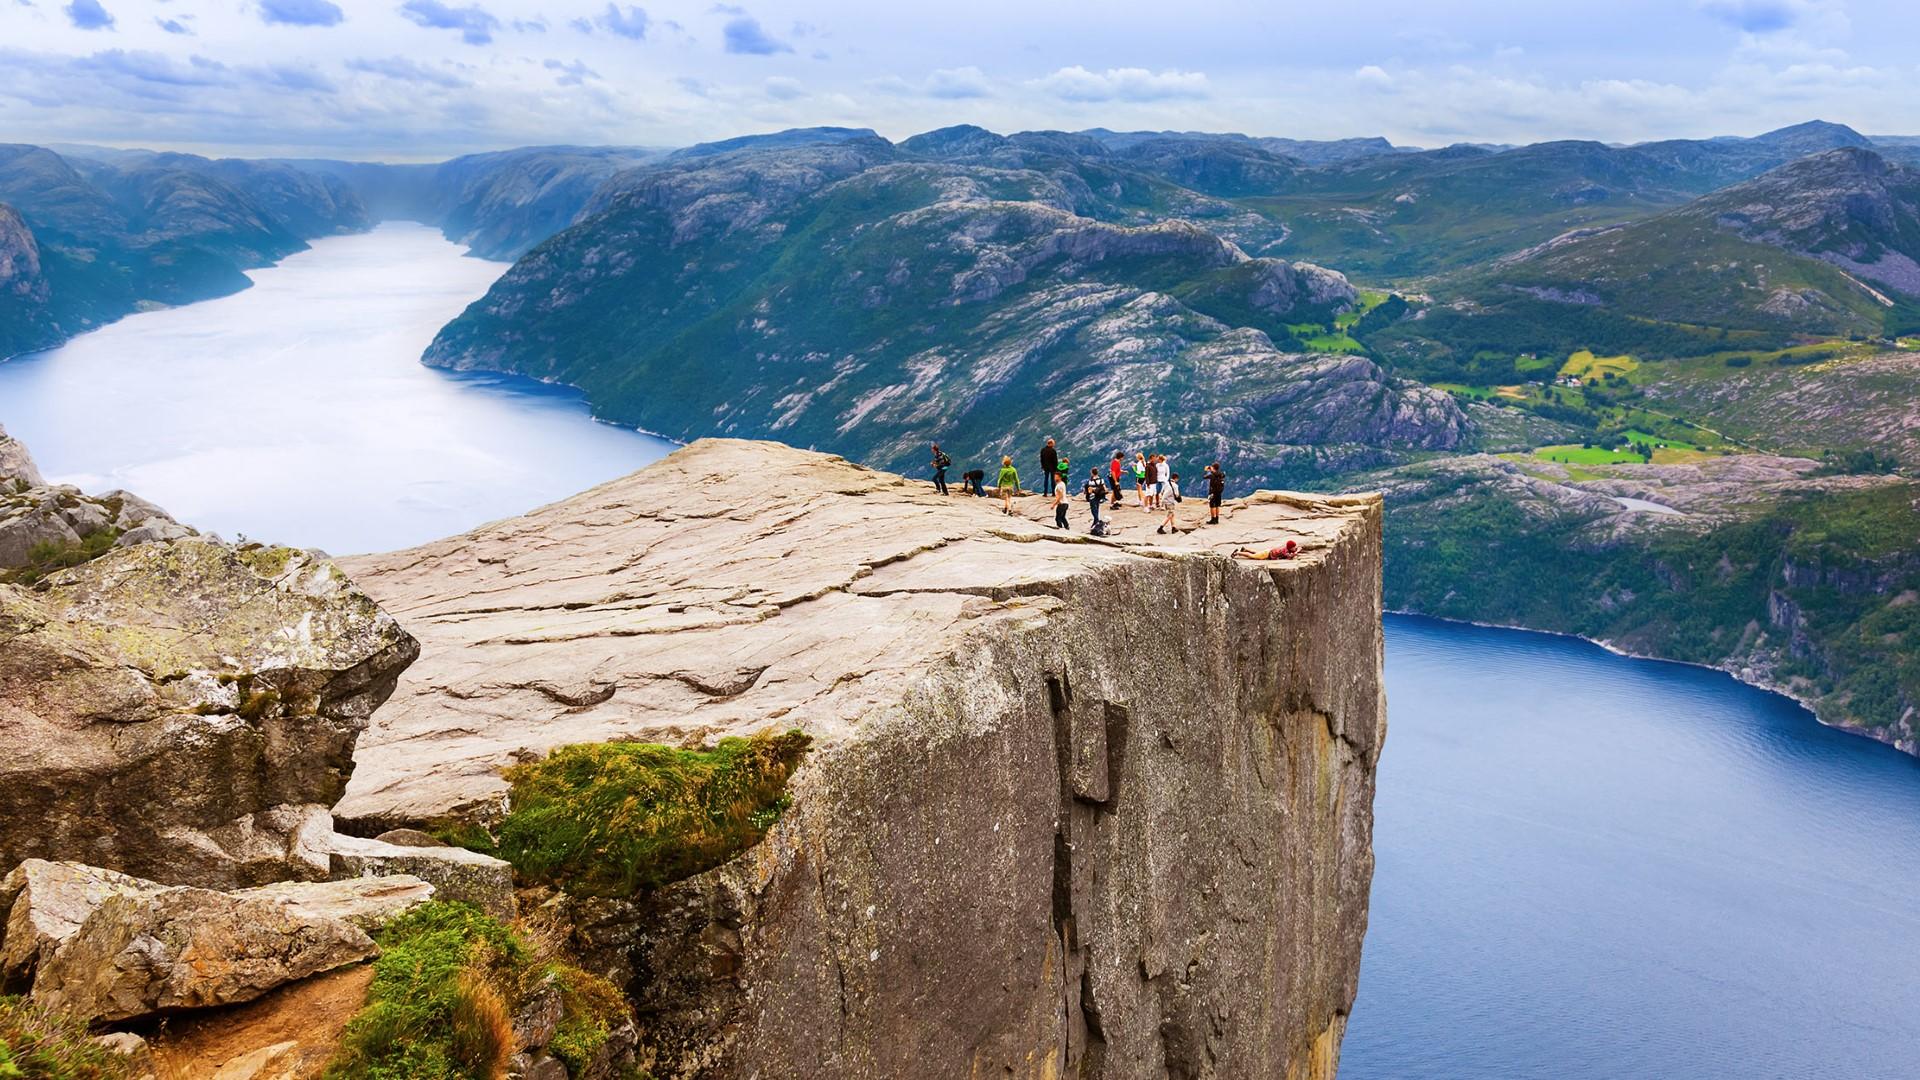 day-9_lysefjord_on-top-of-the-pulpit-rockpreikestolen_shutterstock